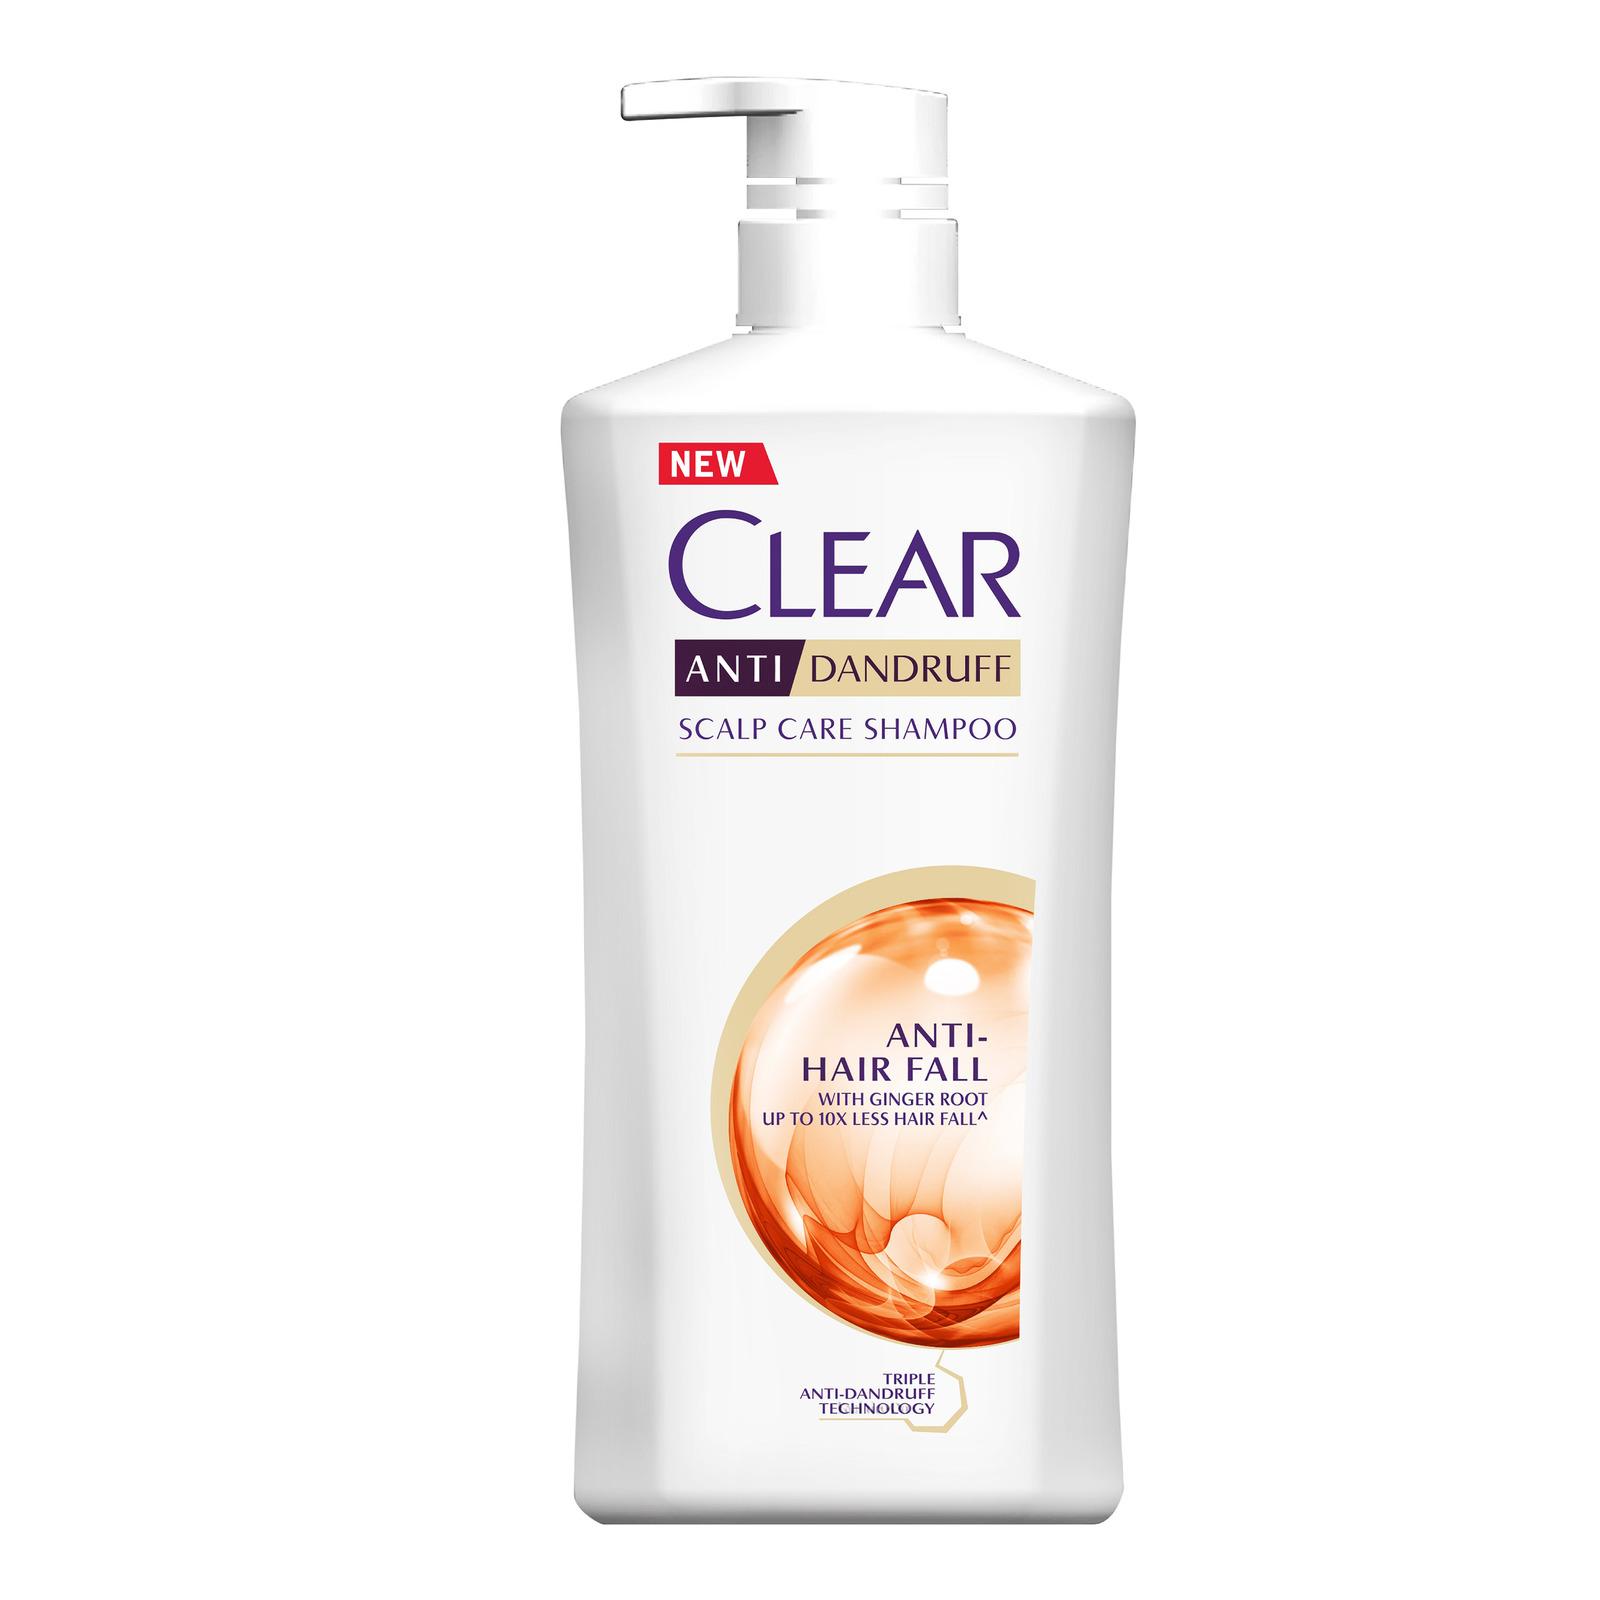 Clear Anti-Dandruff Scalp Care Shampoo - Anti-Hair Fall